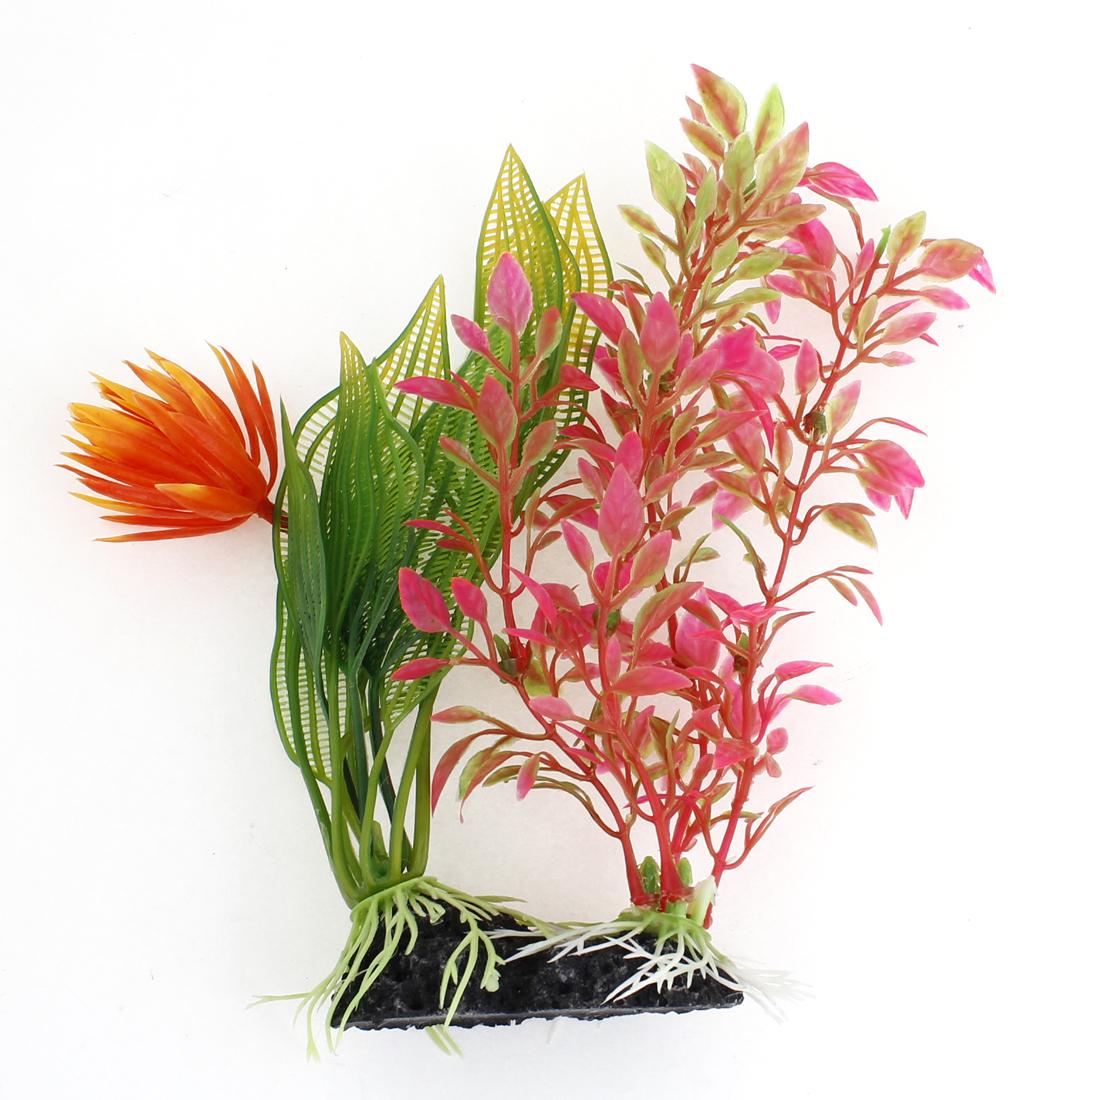 18cm Height Dark Pink Green Orange Plastic Water Grass for Fish Tank Decor